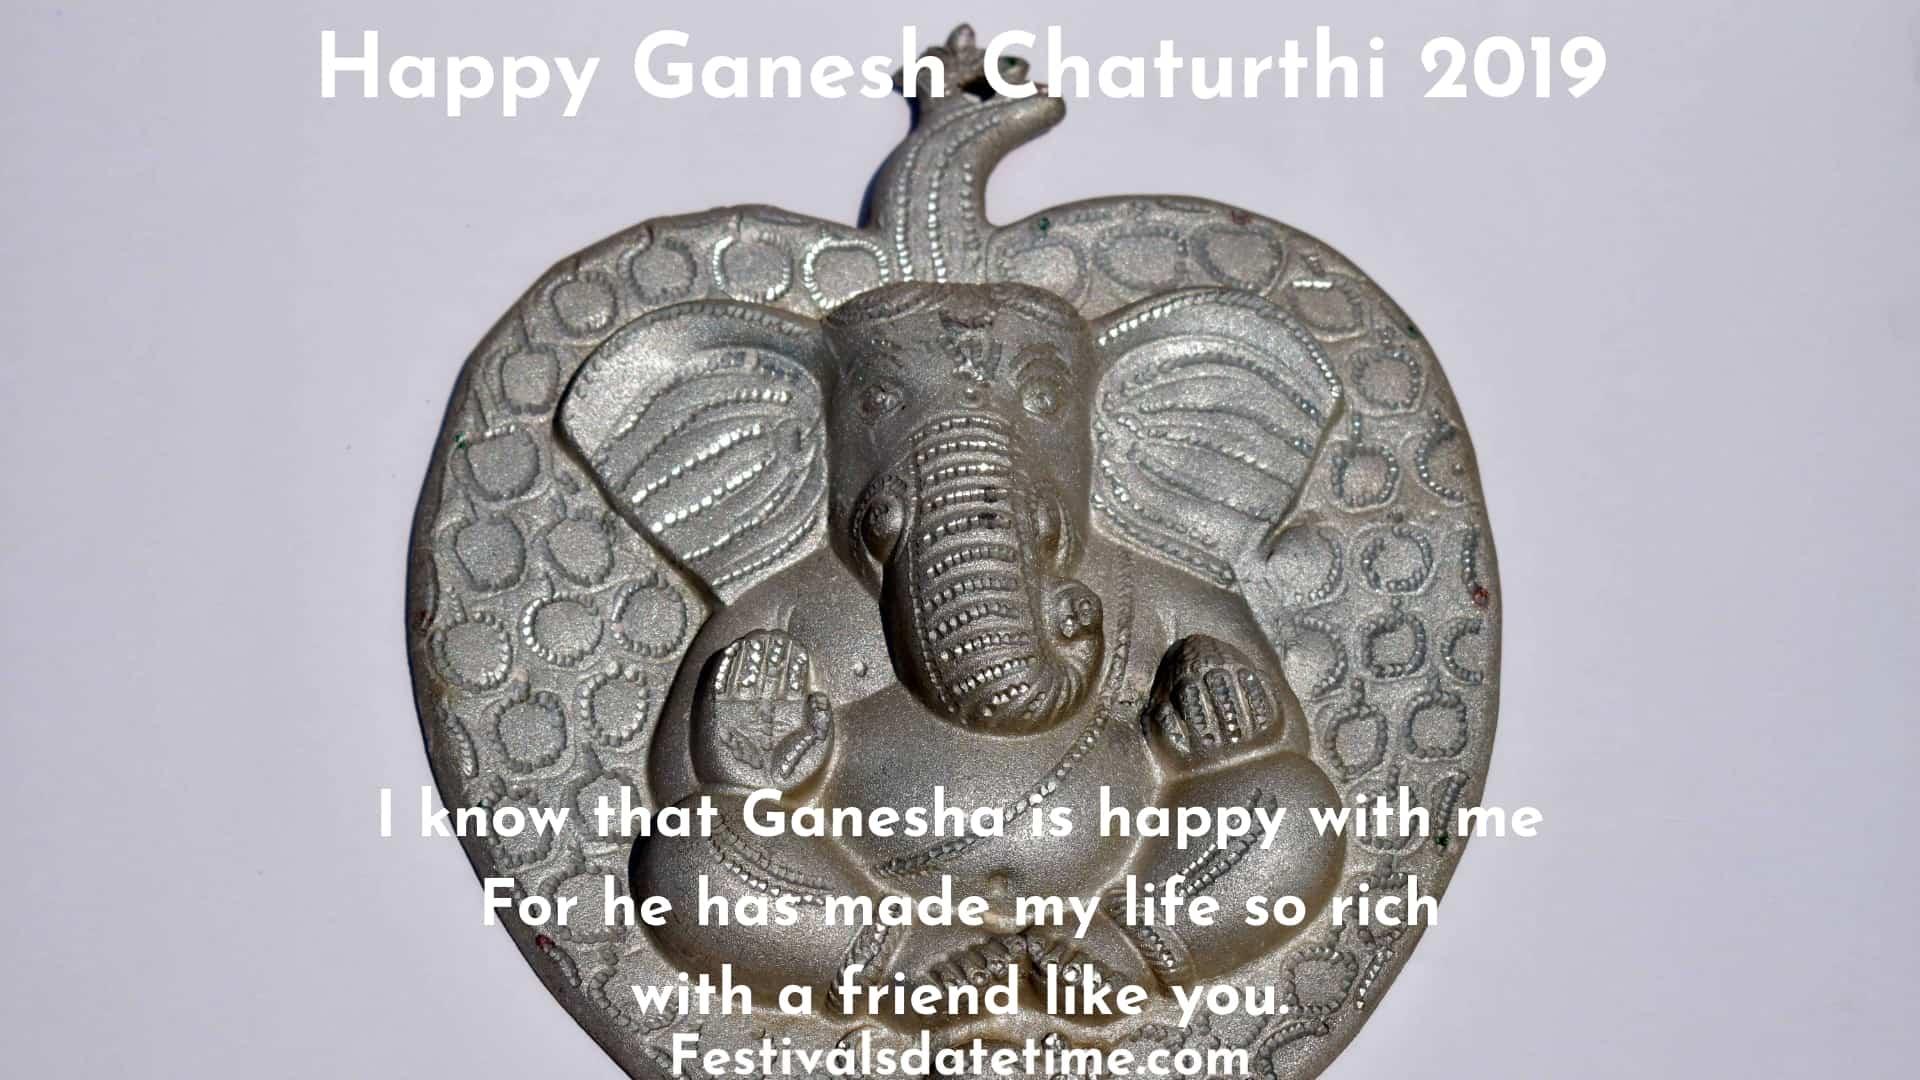 ganesh_chaturthi_wishes_for_fb